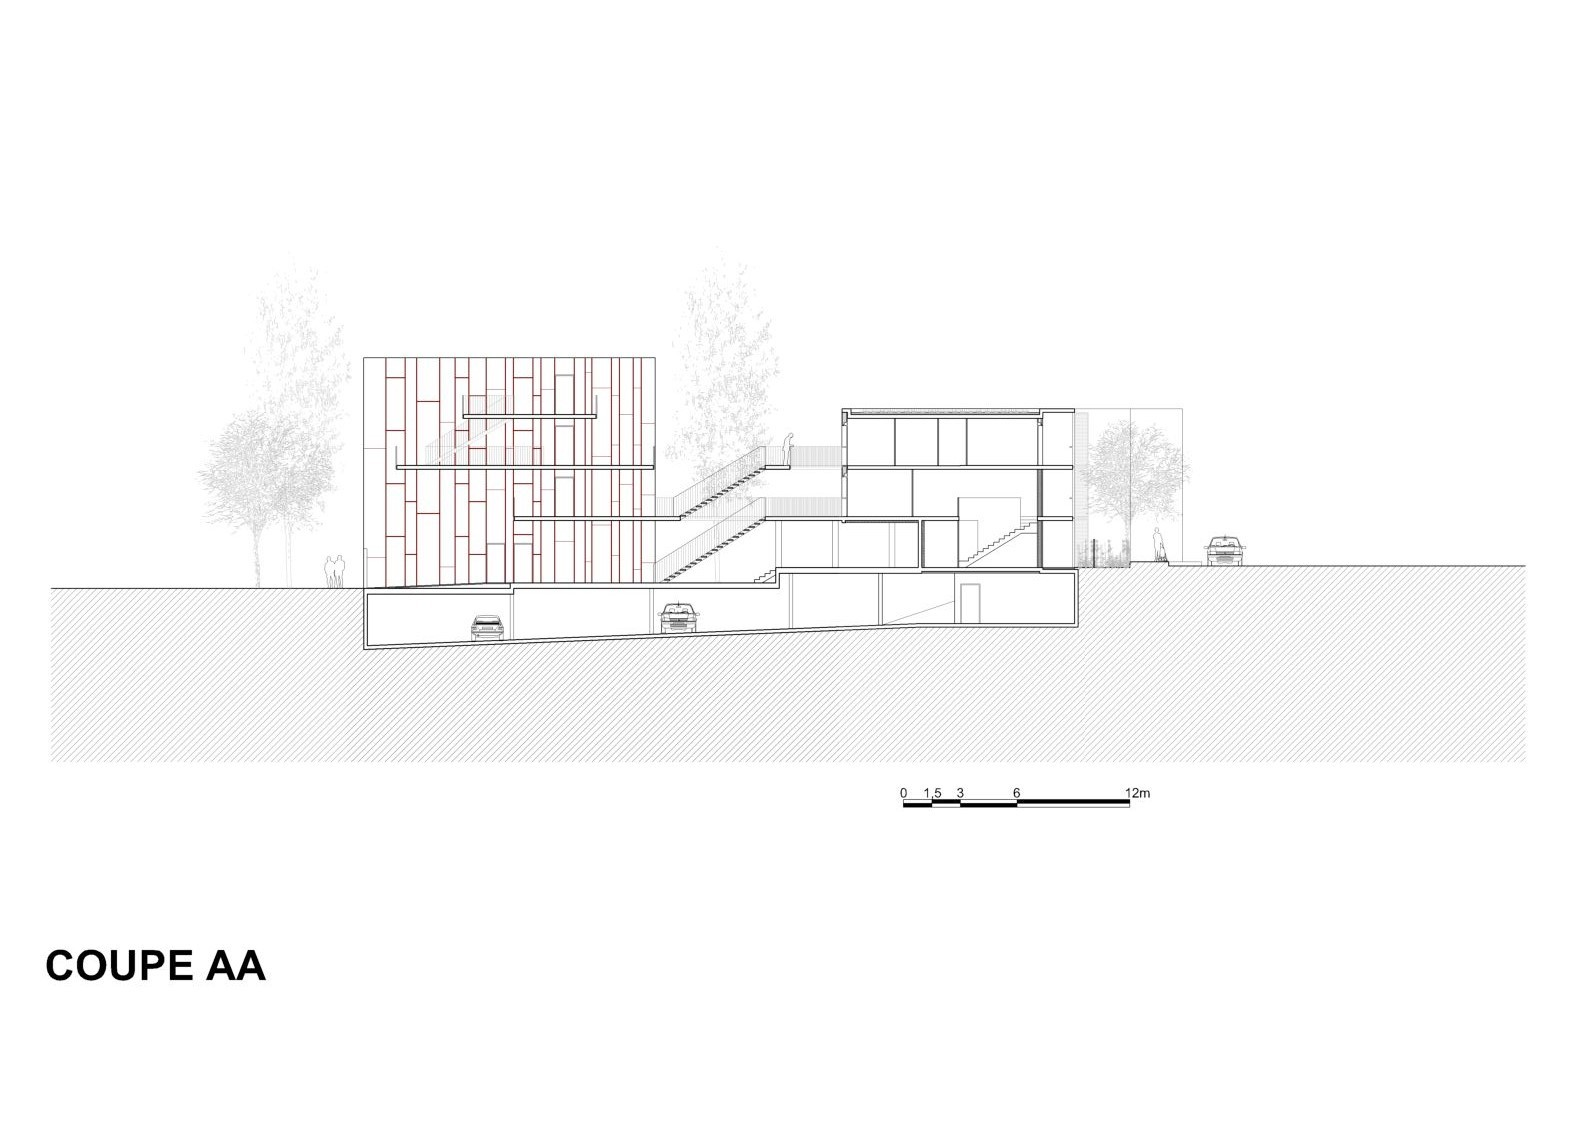 galer a de vivienda social tiendas en mouans sartoux comte et vollenweider architectes 46. Black Bedroom Furniture Sets. Home Design Ideas